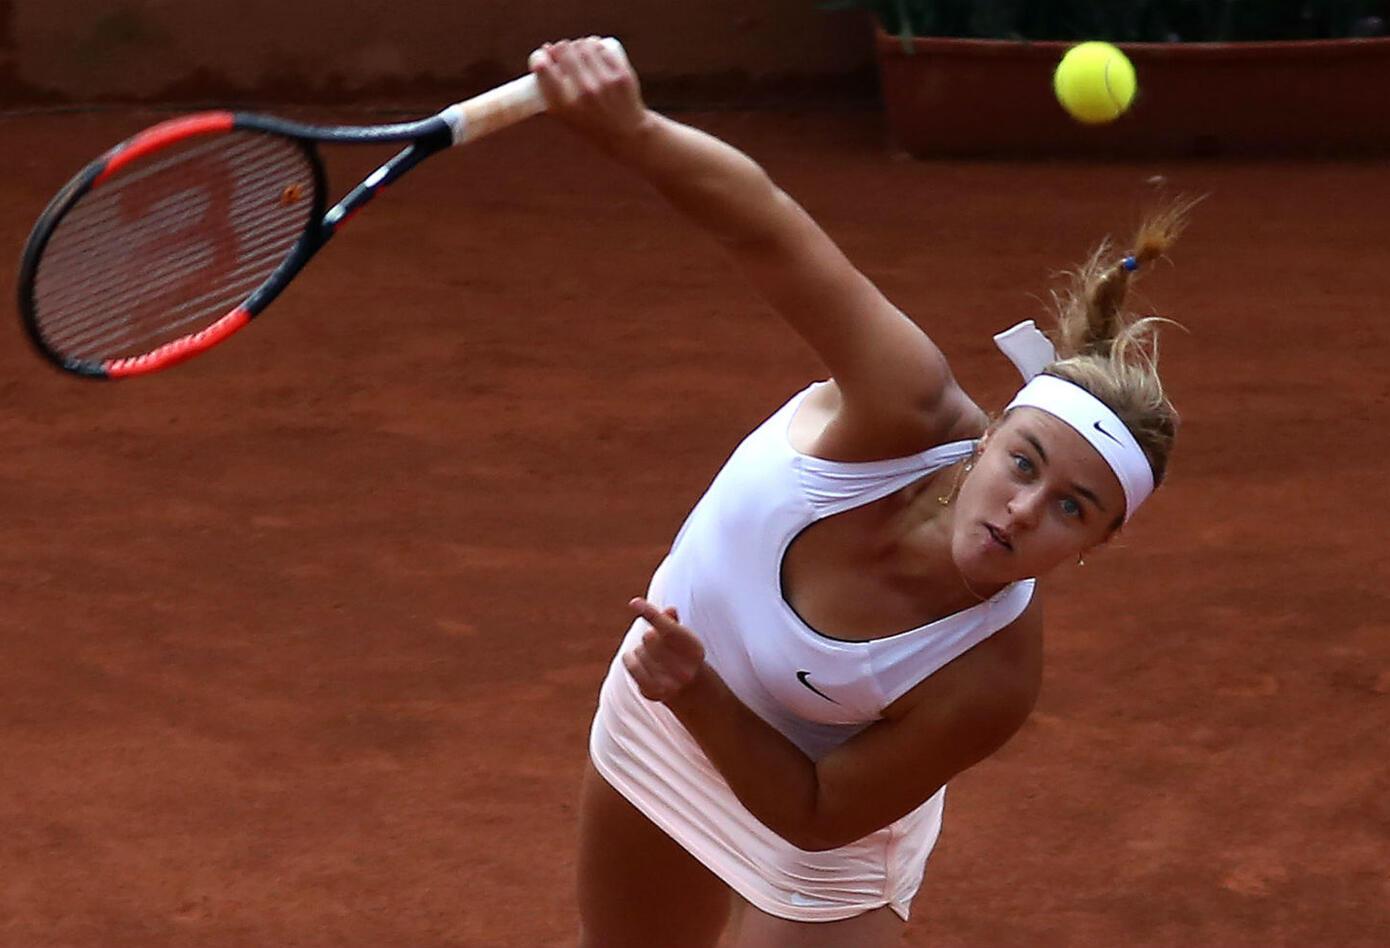 La tenista eslovaca Anna Karolina Schmiedlova